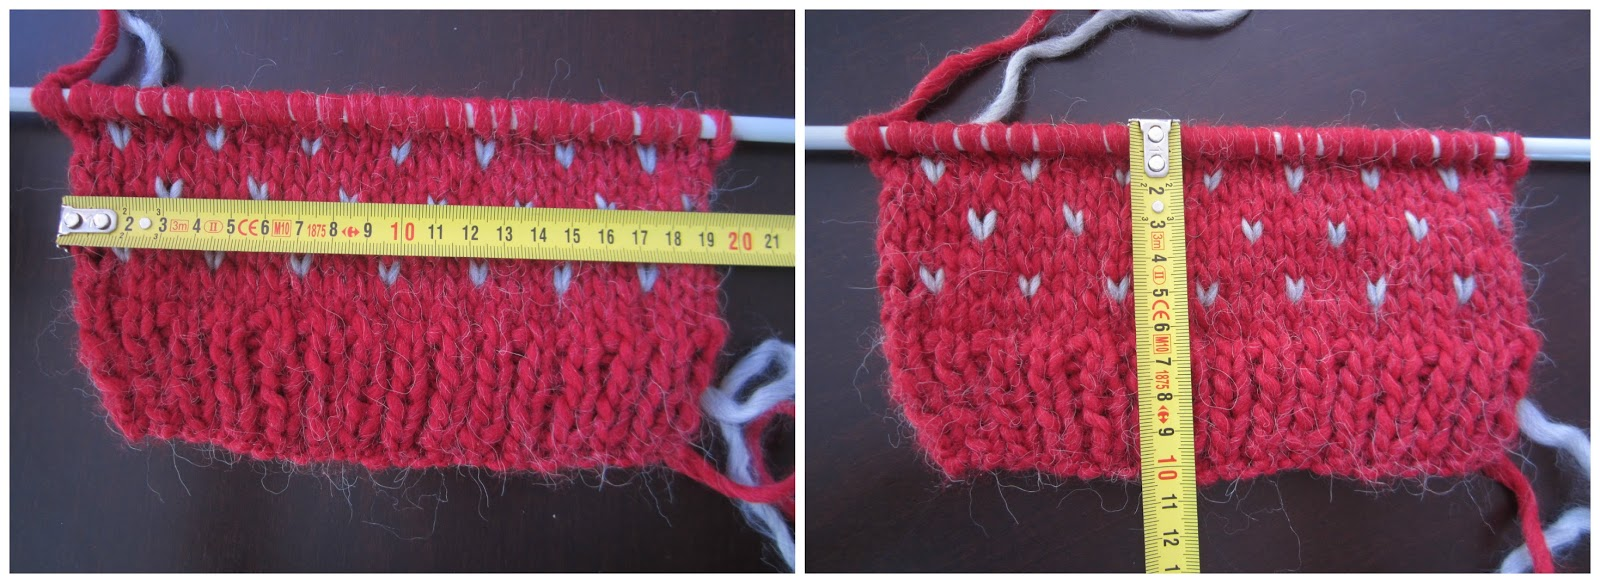 mis nancys, mis peques y yo, tutorial gorros de lana nancy, medidas